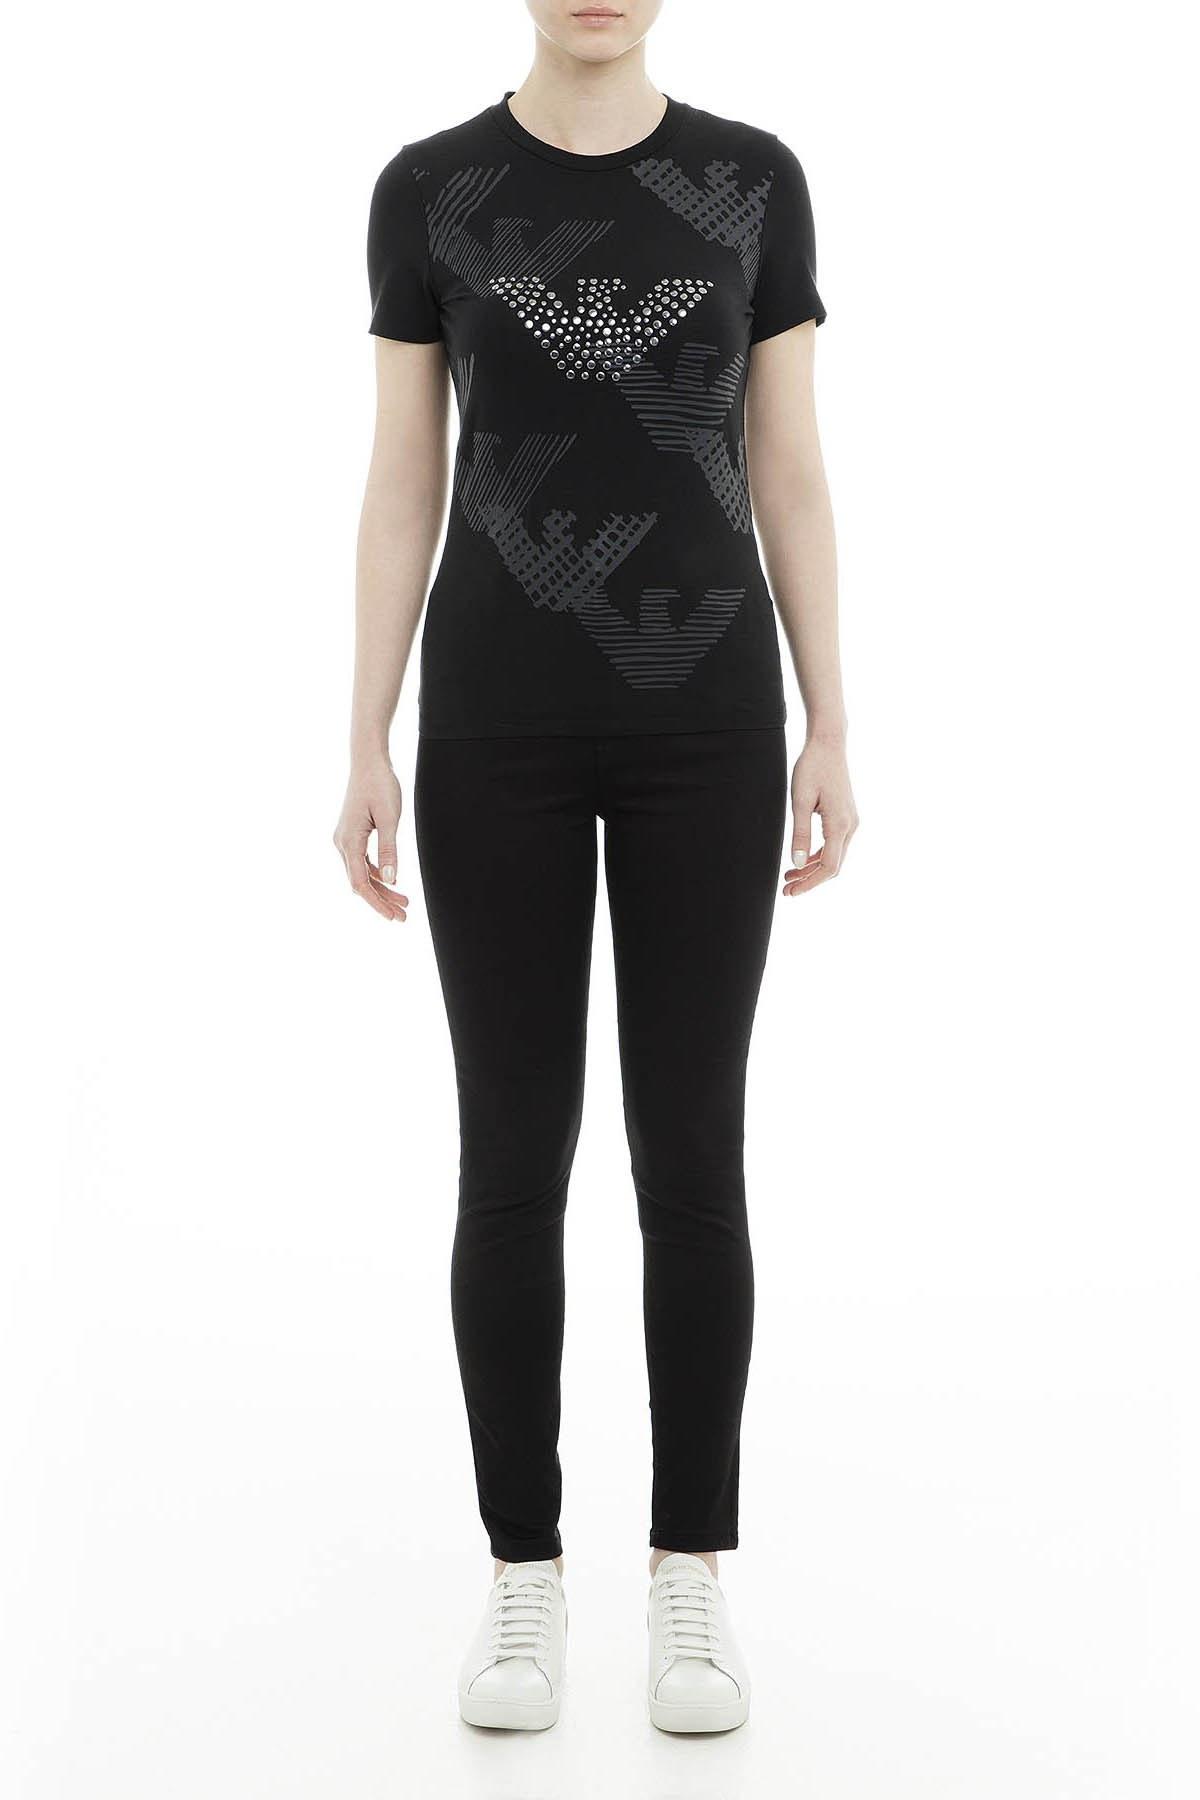 Emporio Armani Kadın T Shirt 6Z2T69 2J07Z 0999 SİYAH